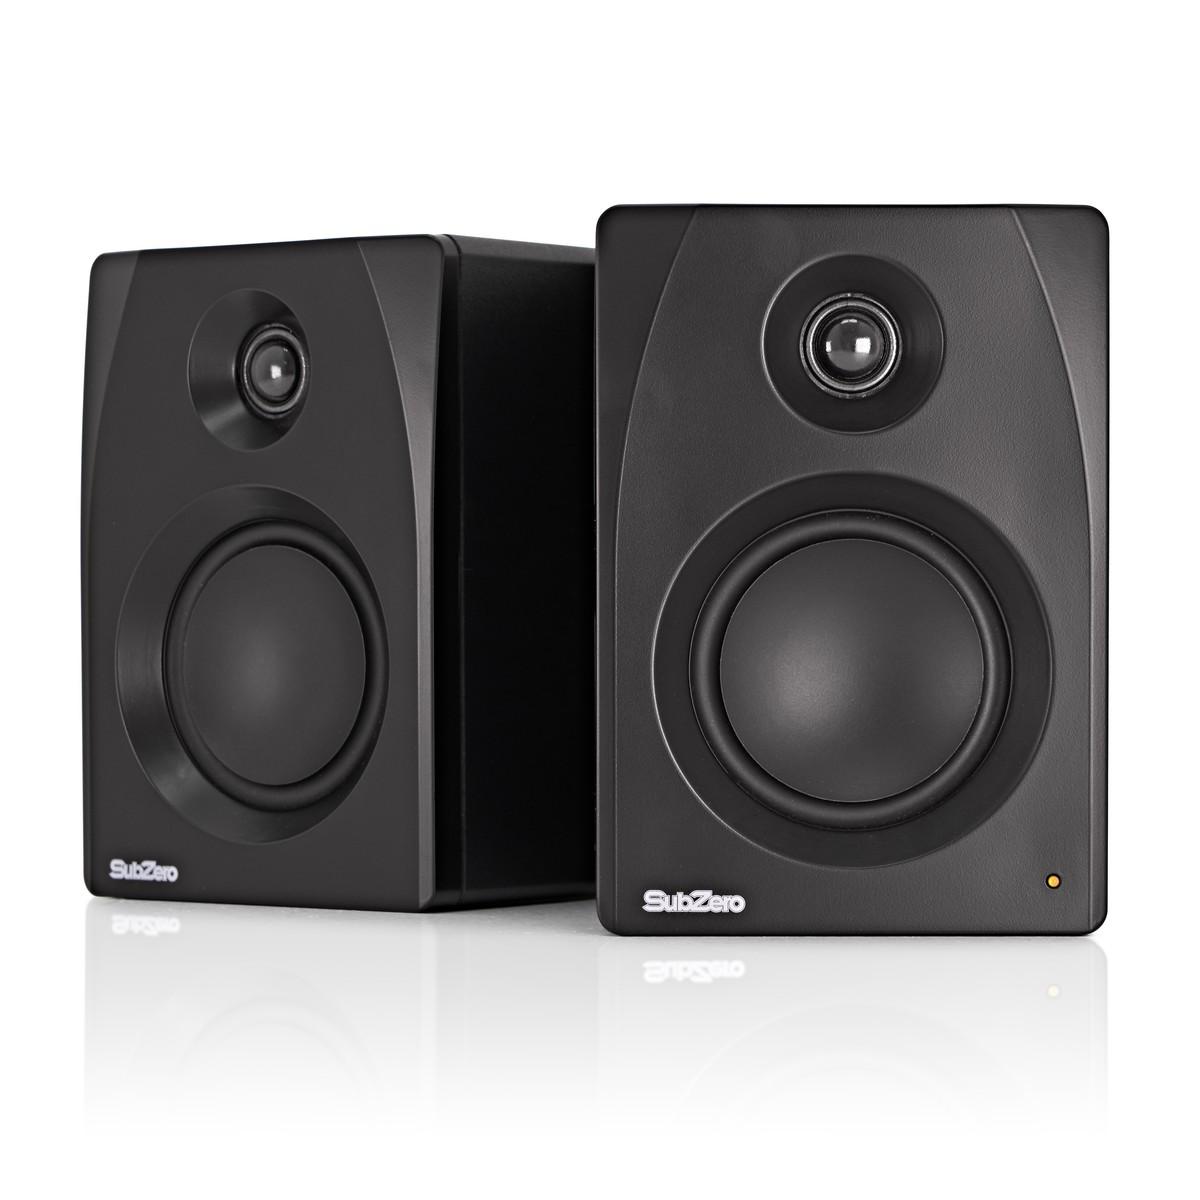 subzero szsm 4x studio monitors pair b stock at gear4music. Black Bedroom Furniture Sets. Home Design Ideas